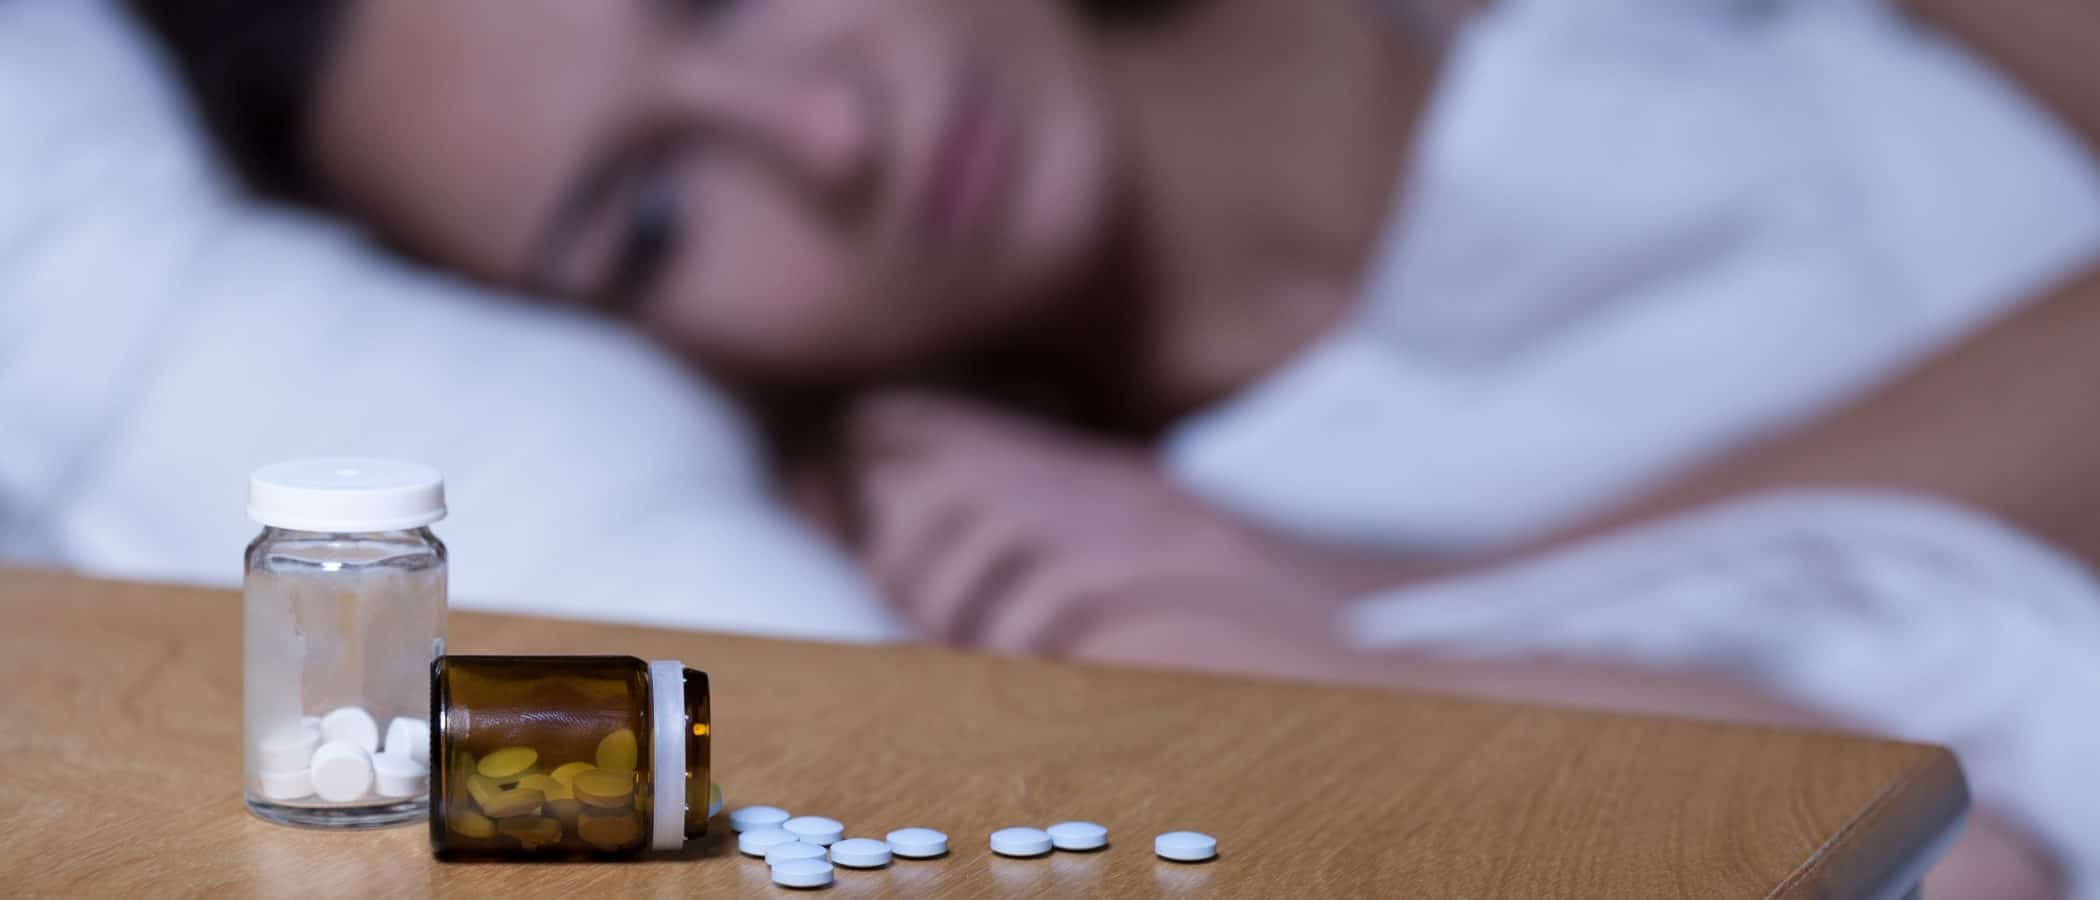 Sleeping-Pills-p7su0z17pbkeovbzxej8rbo8e4nhh4a98x0mwsiey0